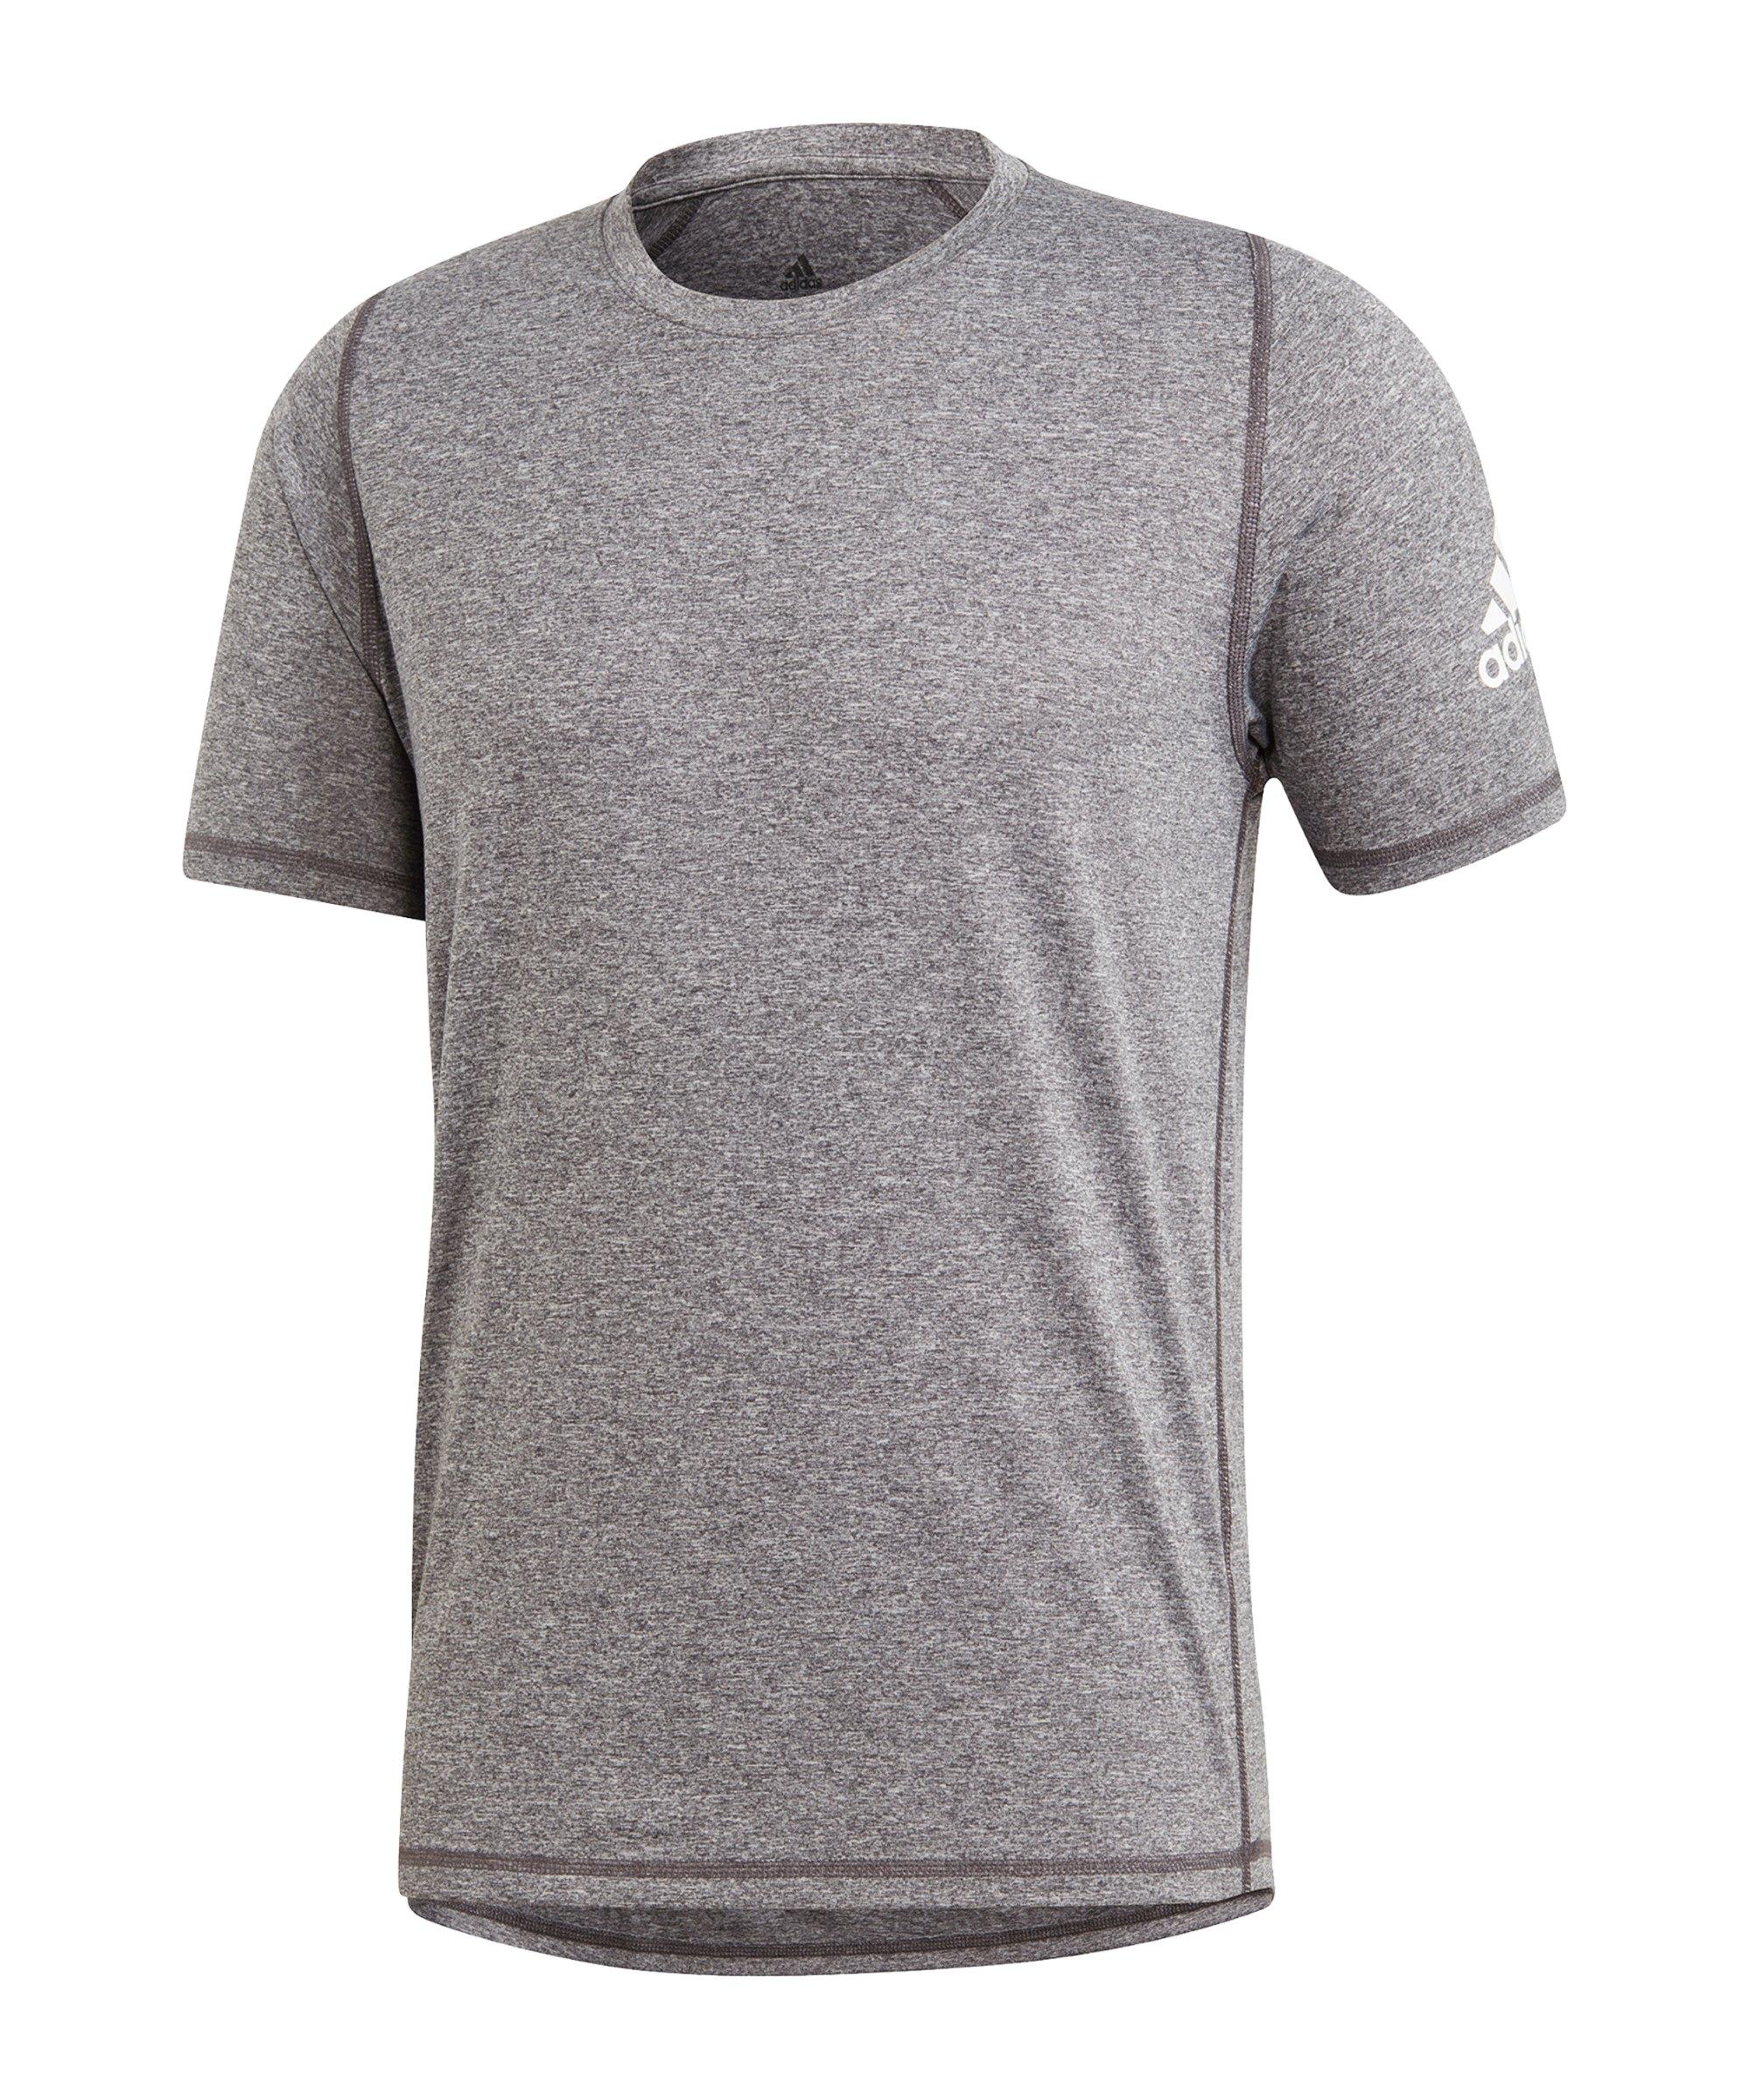 adidas Freelift Ultimate Heather T-Shirt Grau - grau